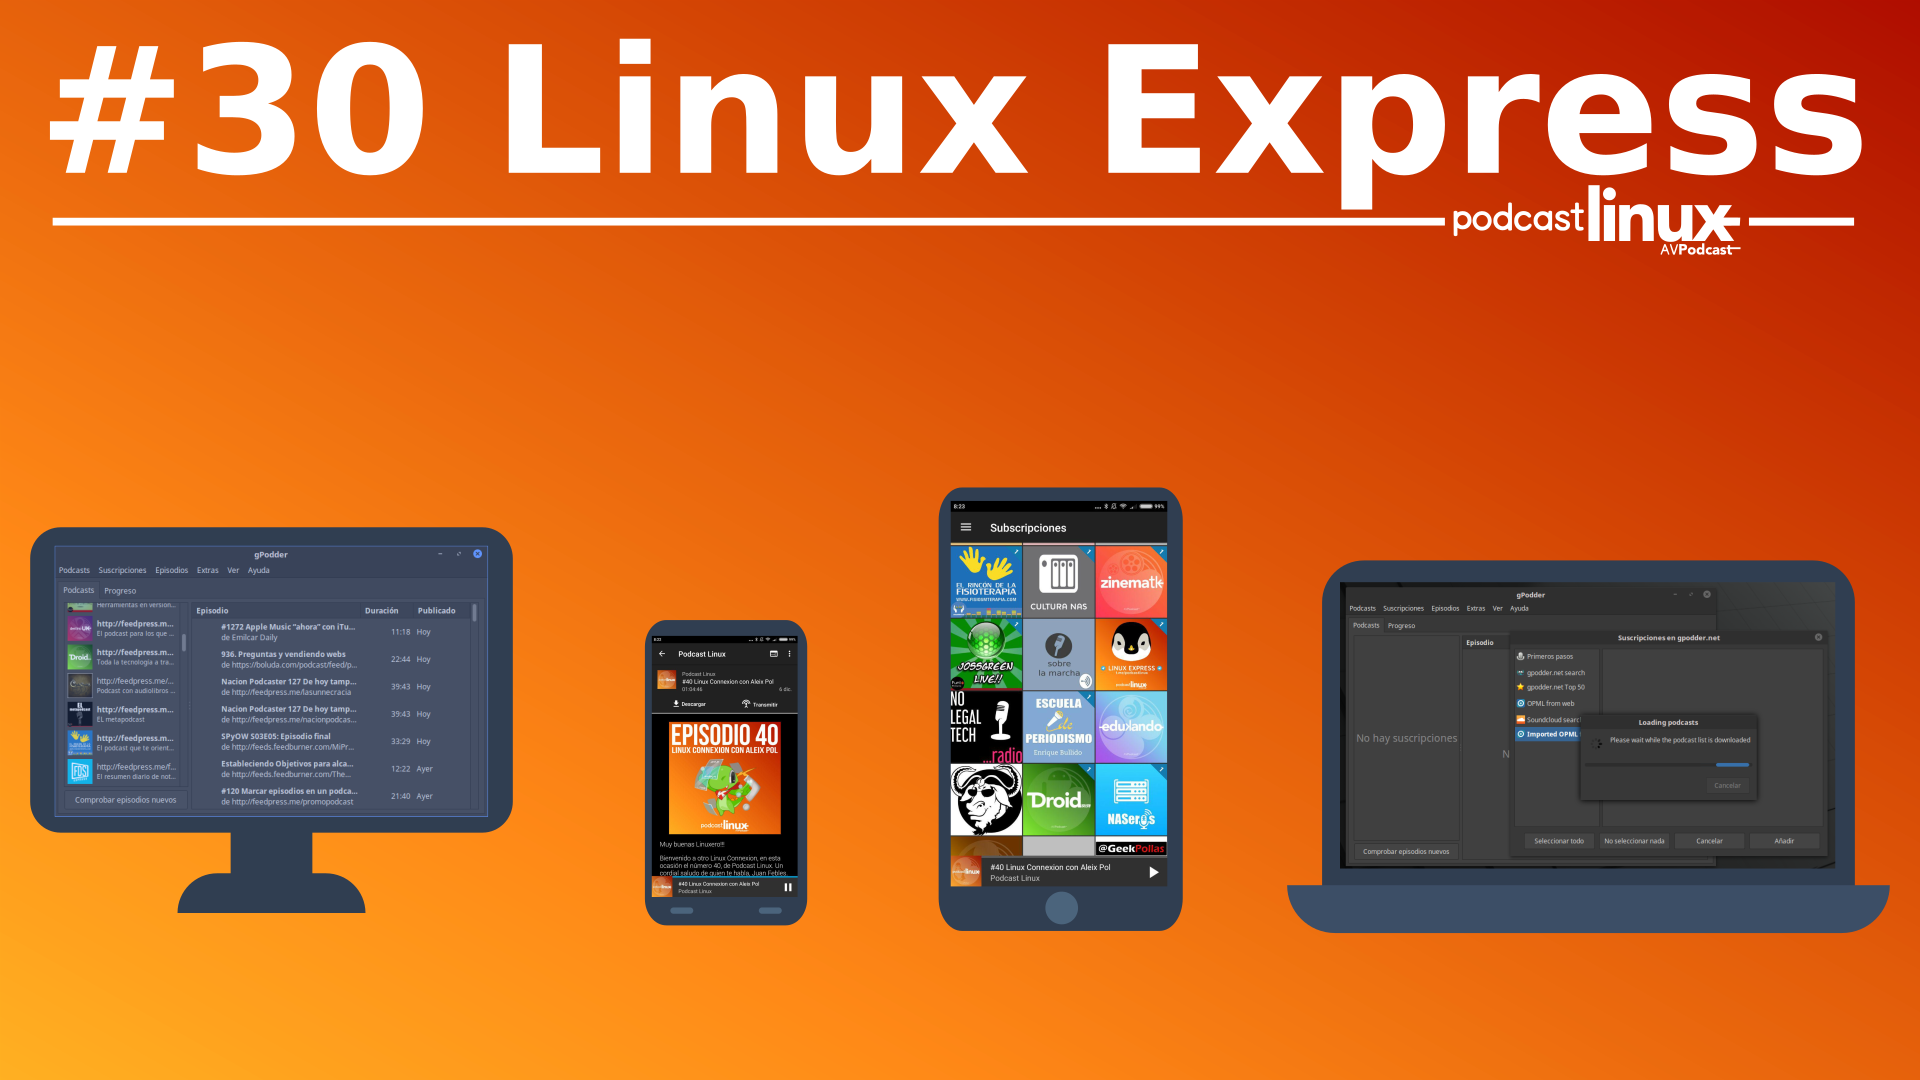 #30 Linux Express